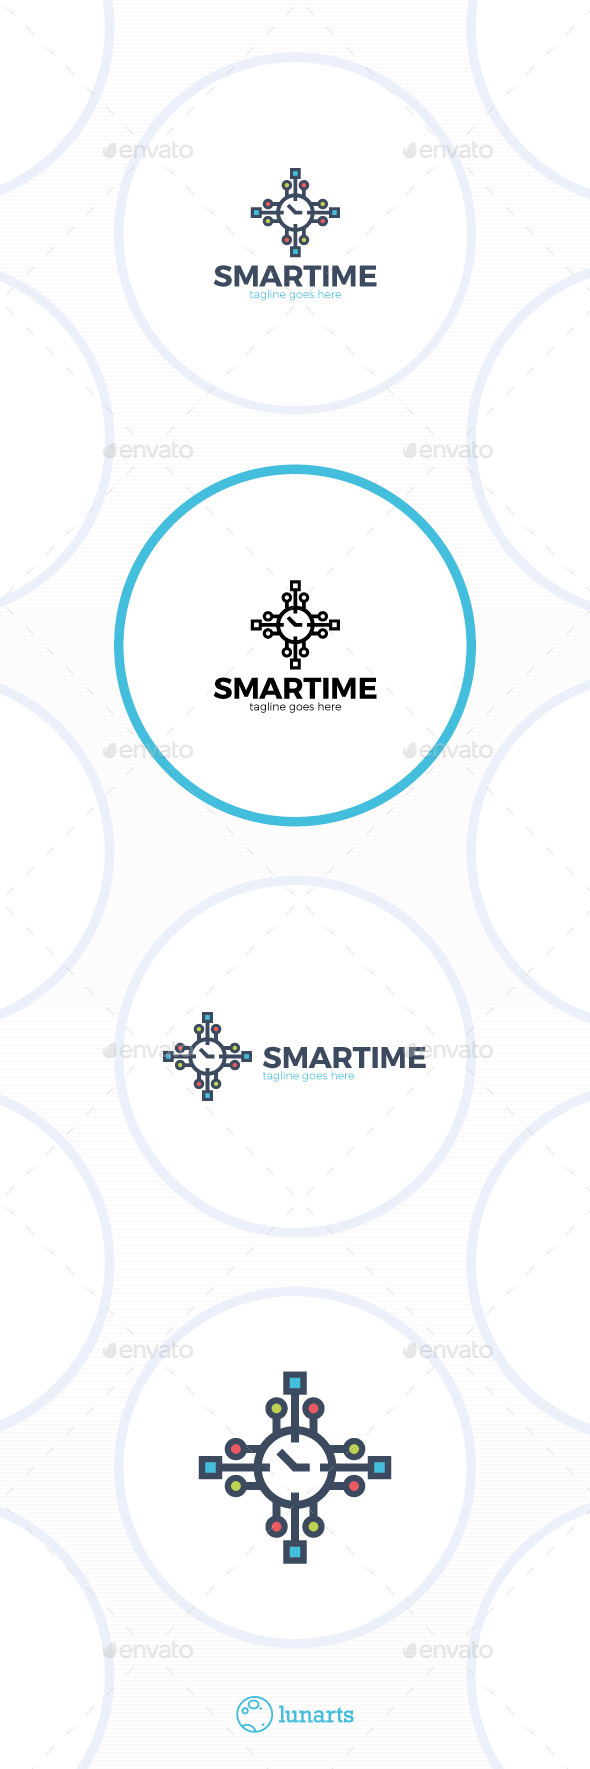 Smart Time Logo - Watch - Food Logo Templates